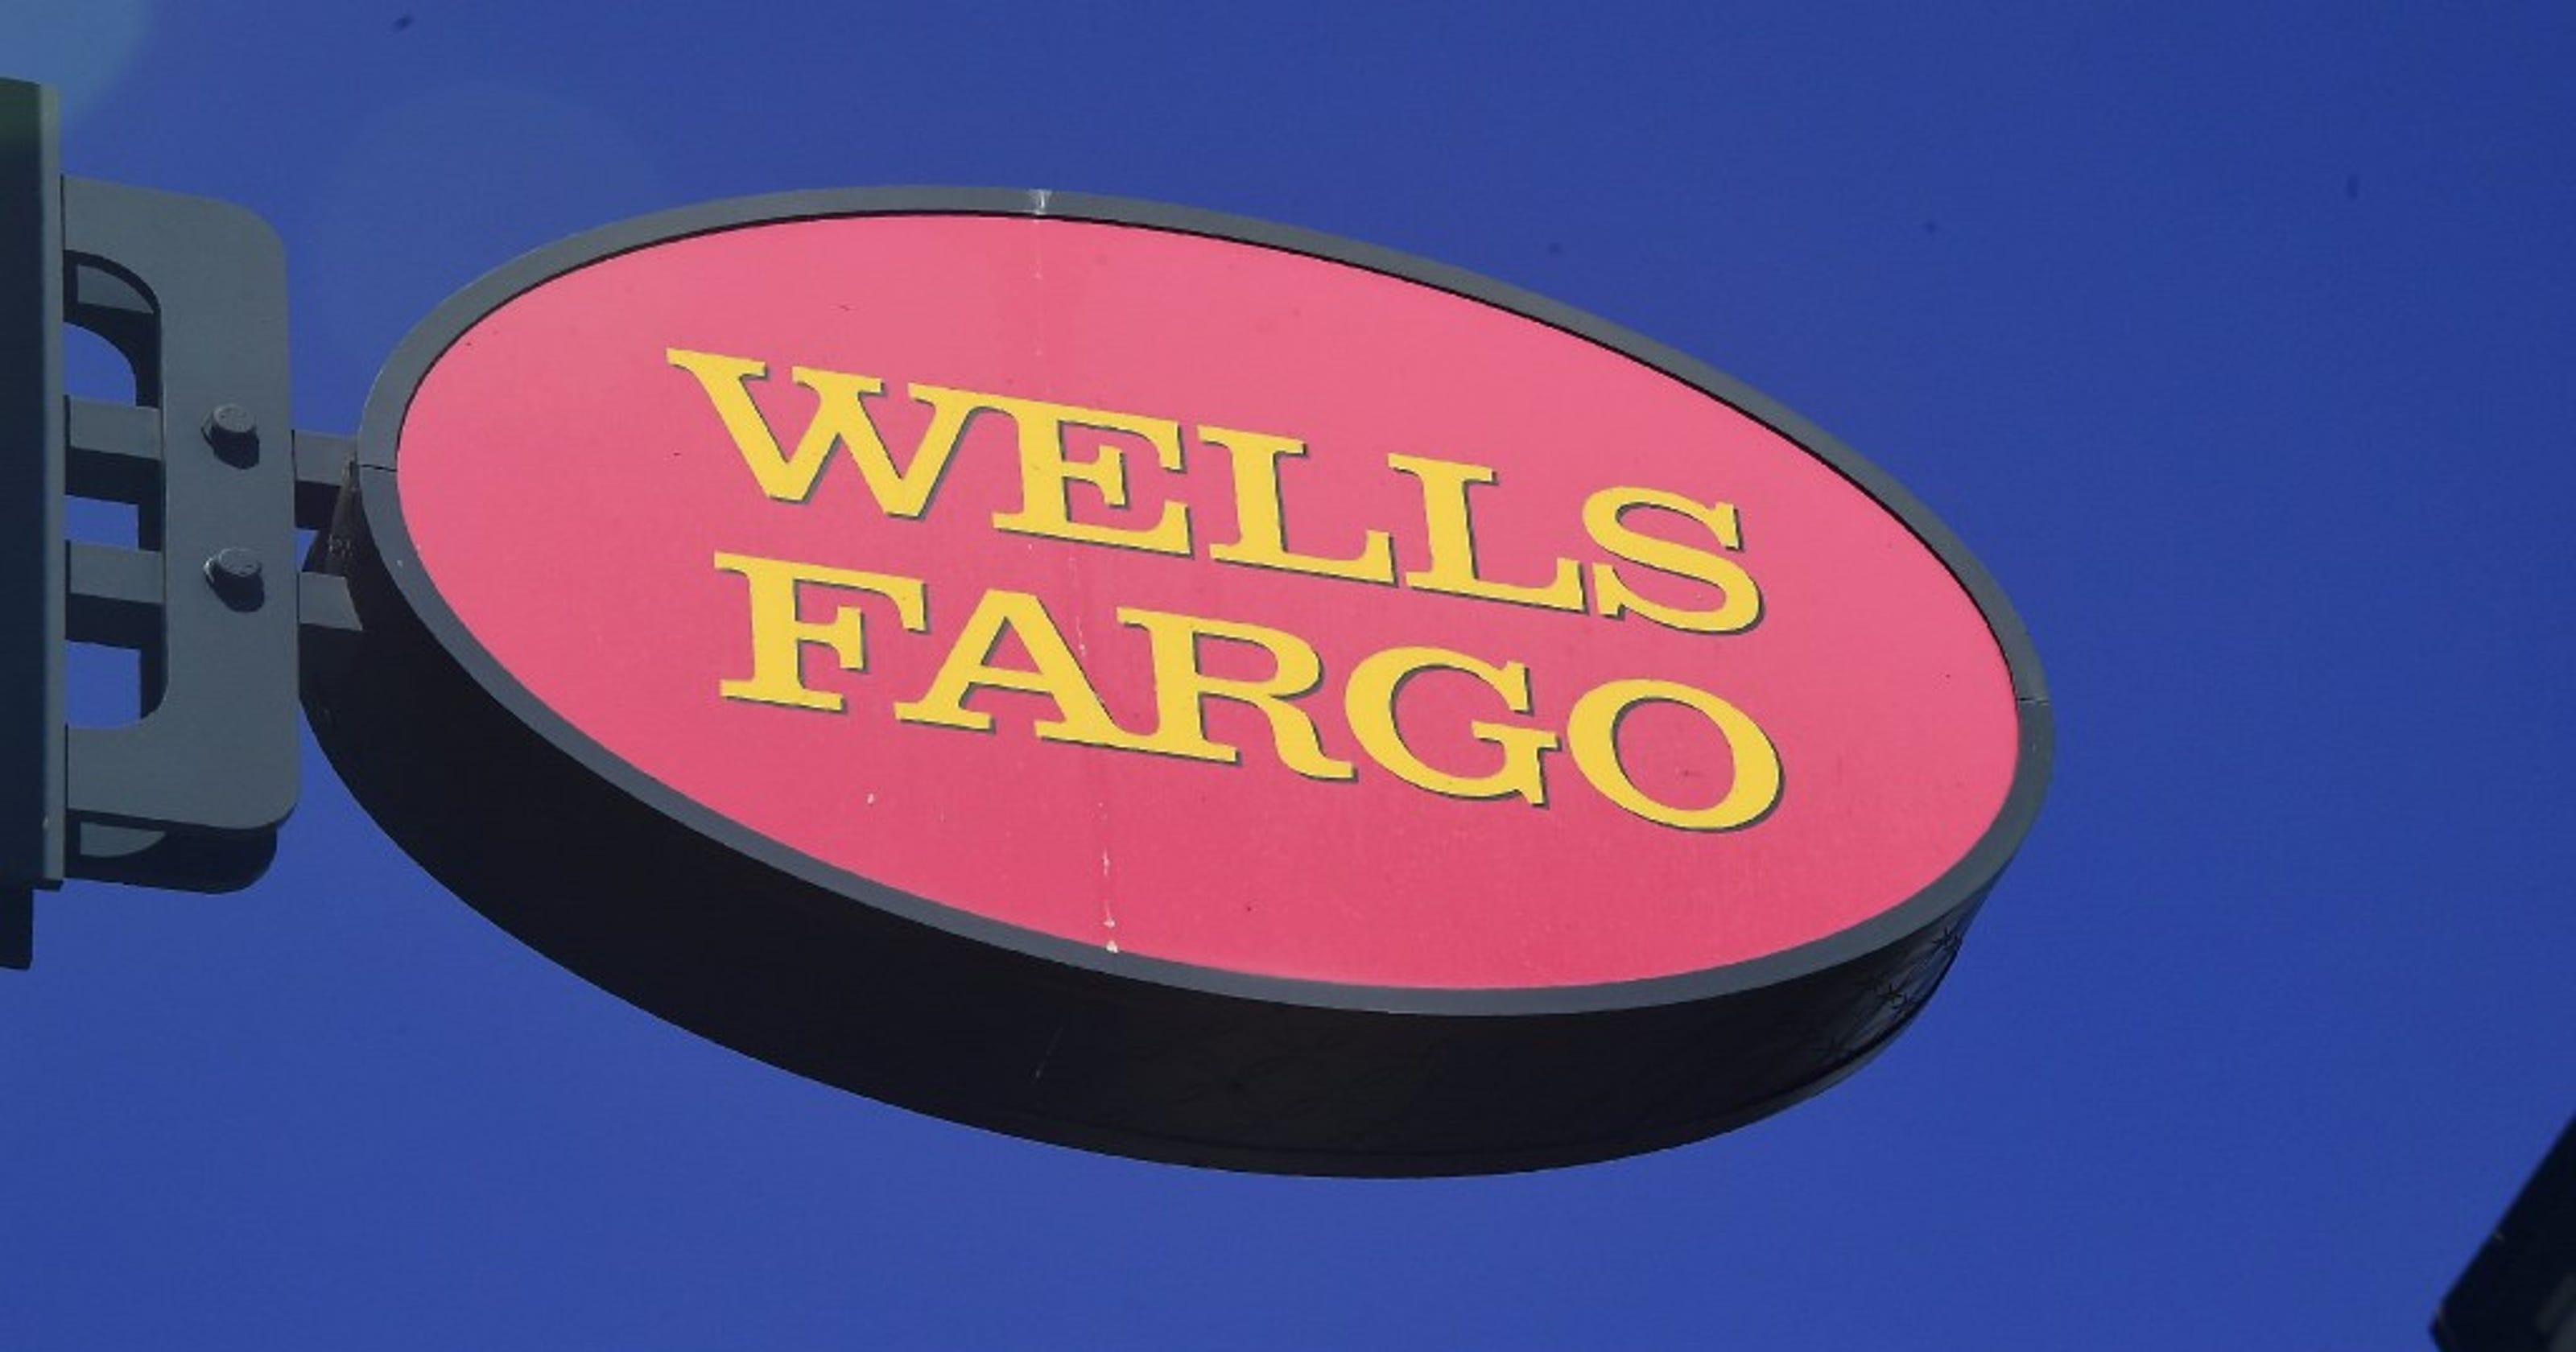 Wells Fargo plans to lay off 46 employees in Menomonee Falls